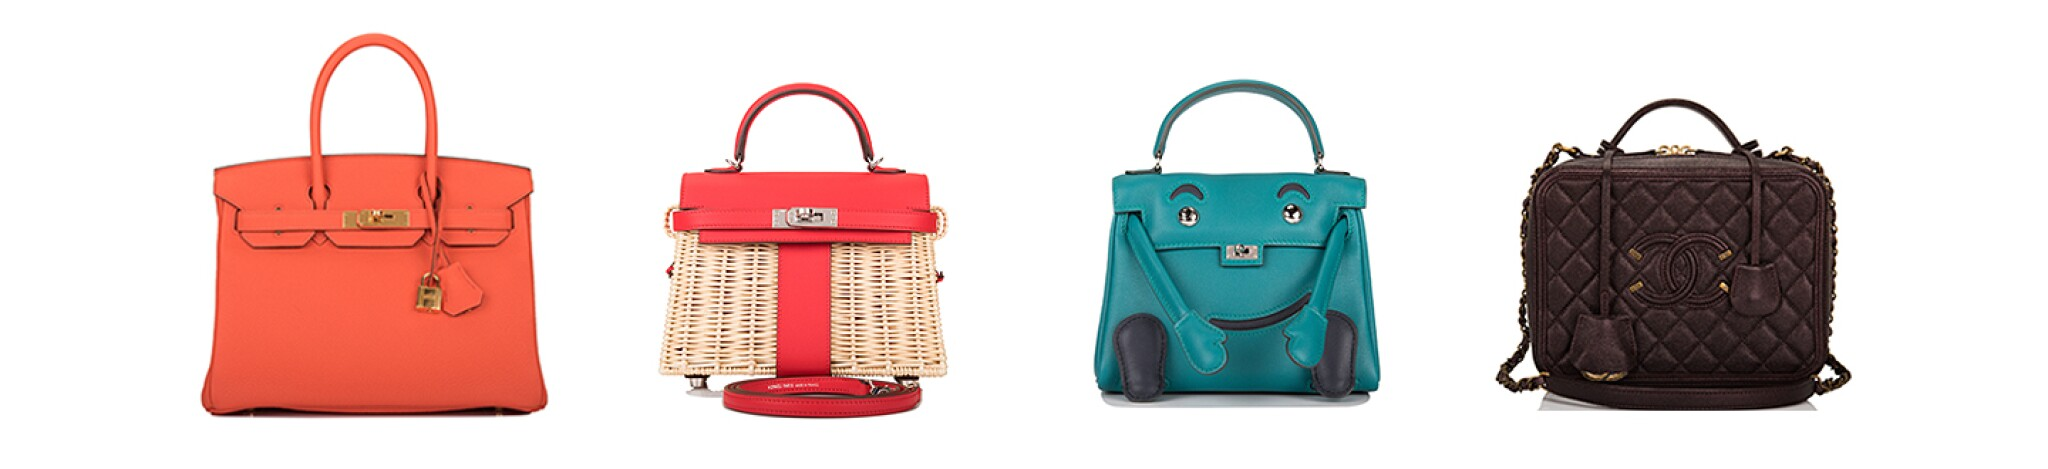 Handbags and Accessories Online